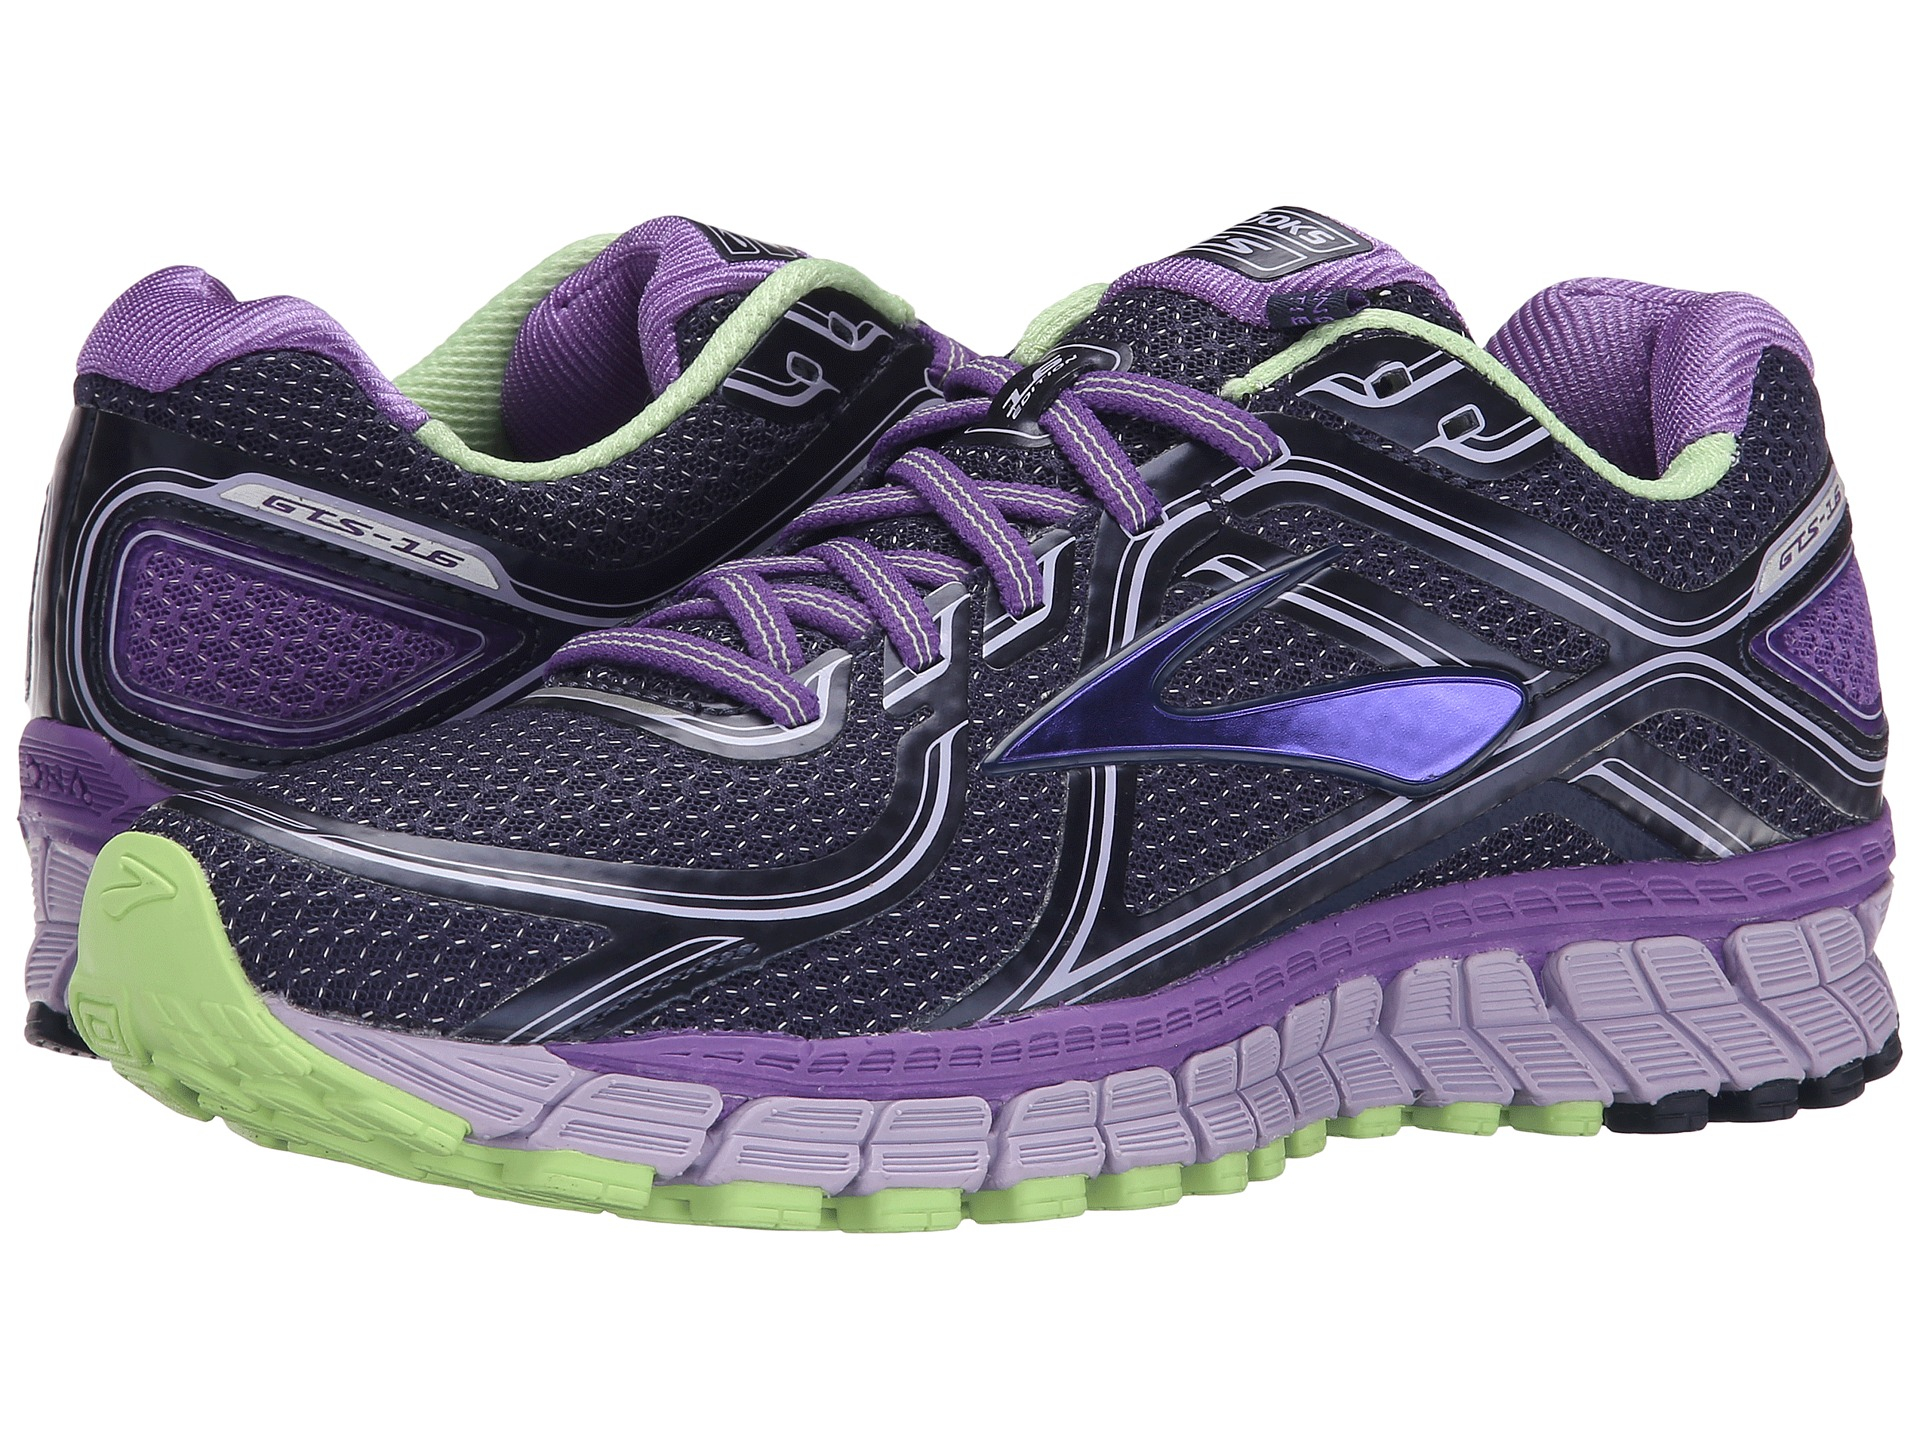 lyst brooks adrenaline gts 16 in purple. Black Bedroom Furniture Sets. Home Design Ideas